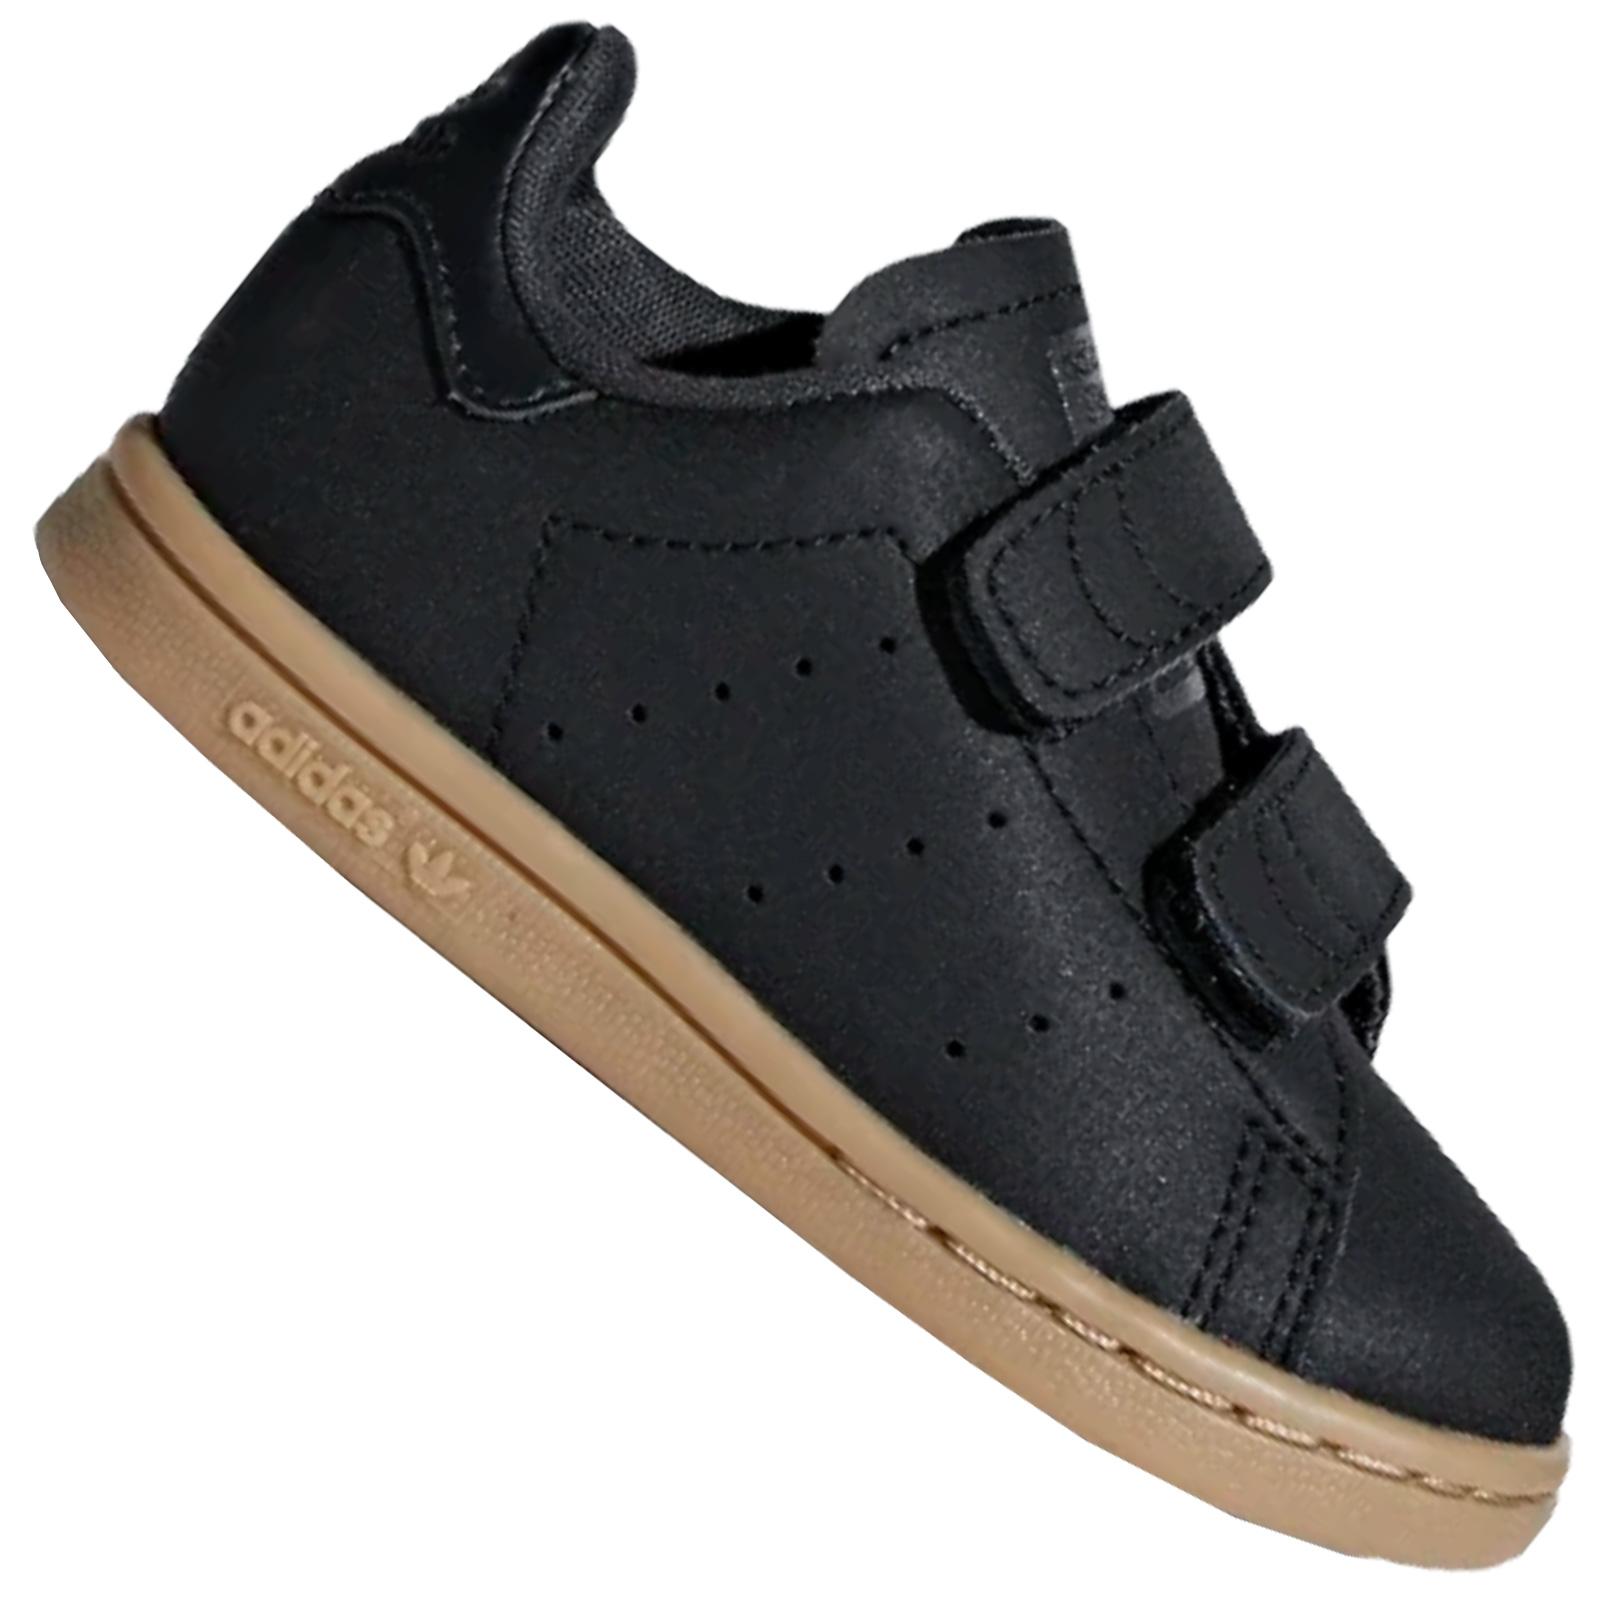 Details about Adidas Originals Stan Smith Trainers Kids Trainers Leather Shoes Matt Black show original title